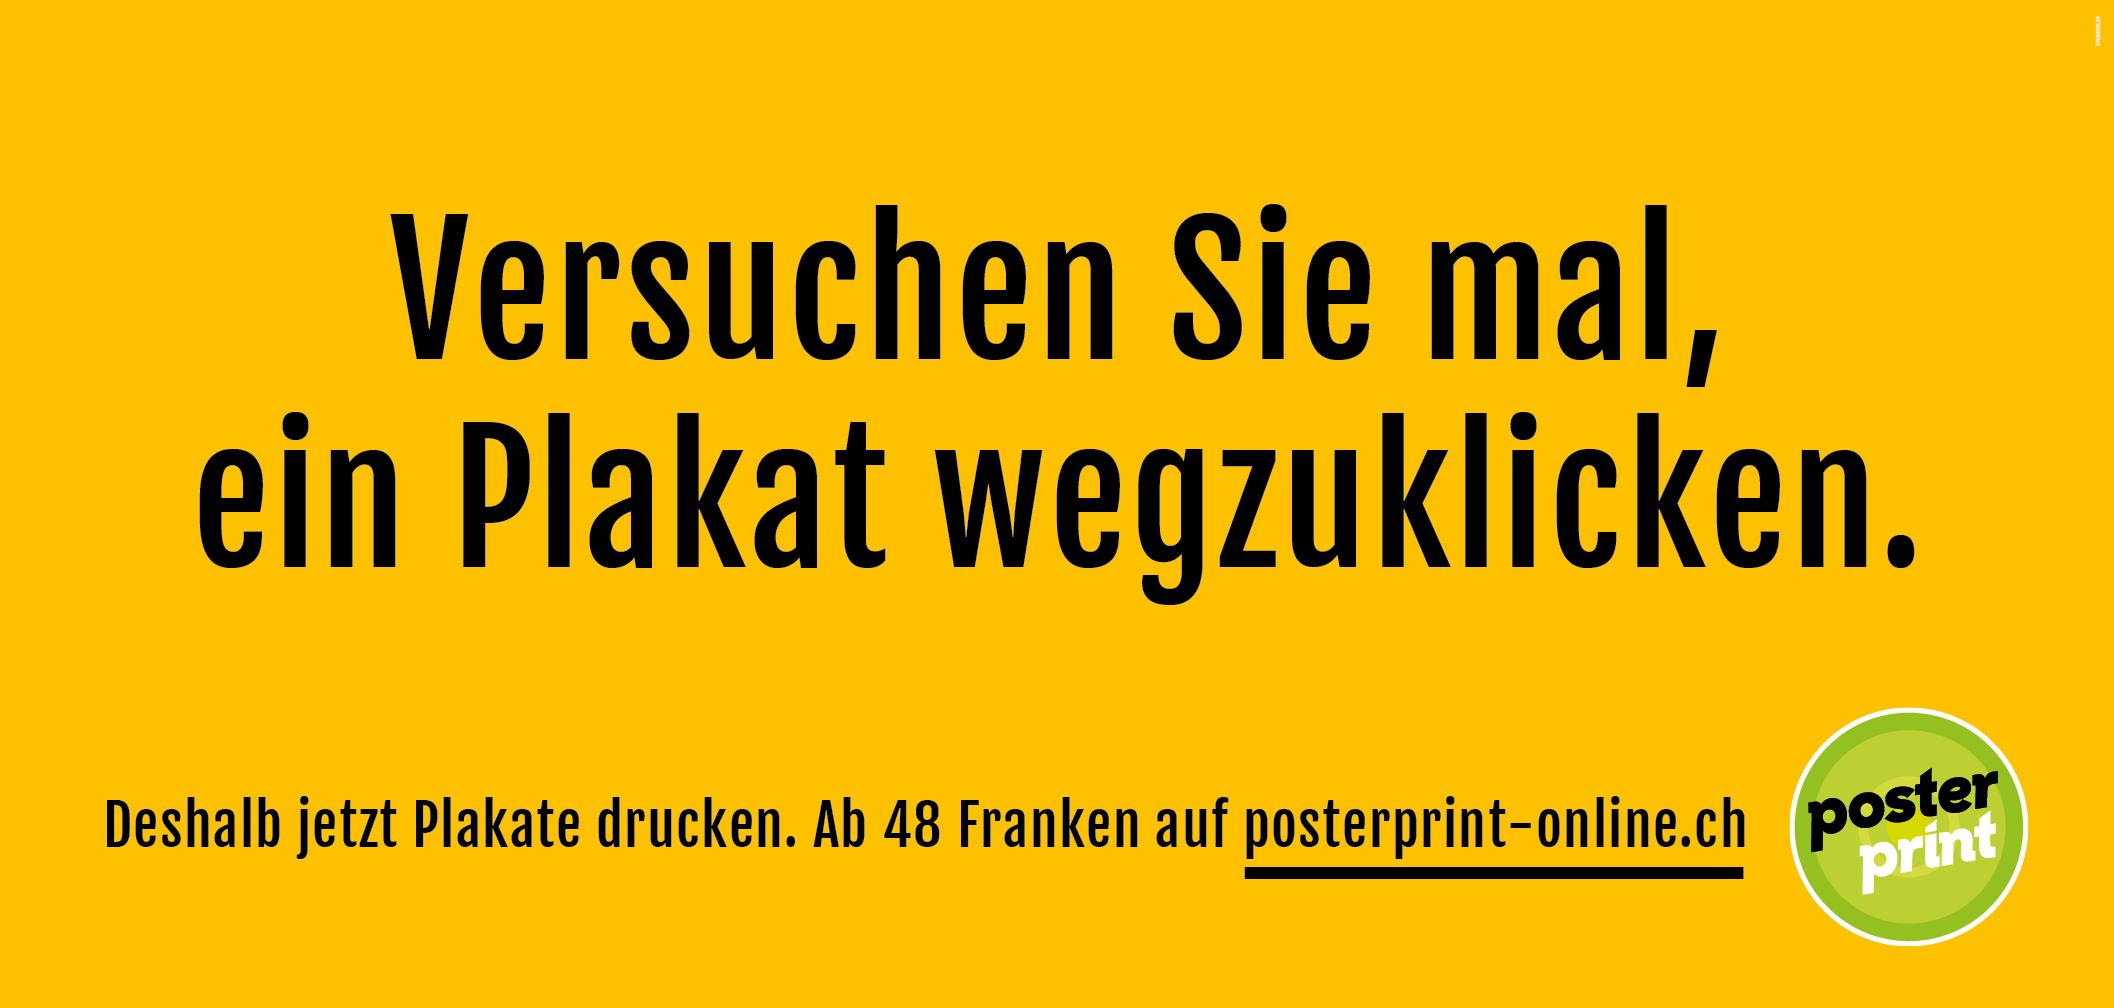 PPO_Kampagne_Desshalb_F12_v24.jpg